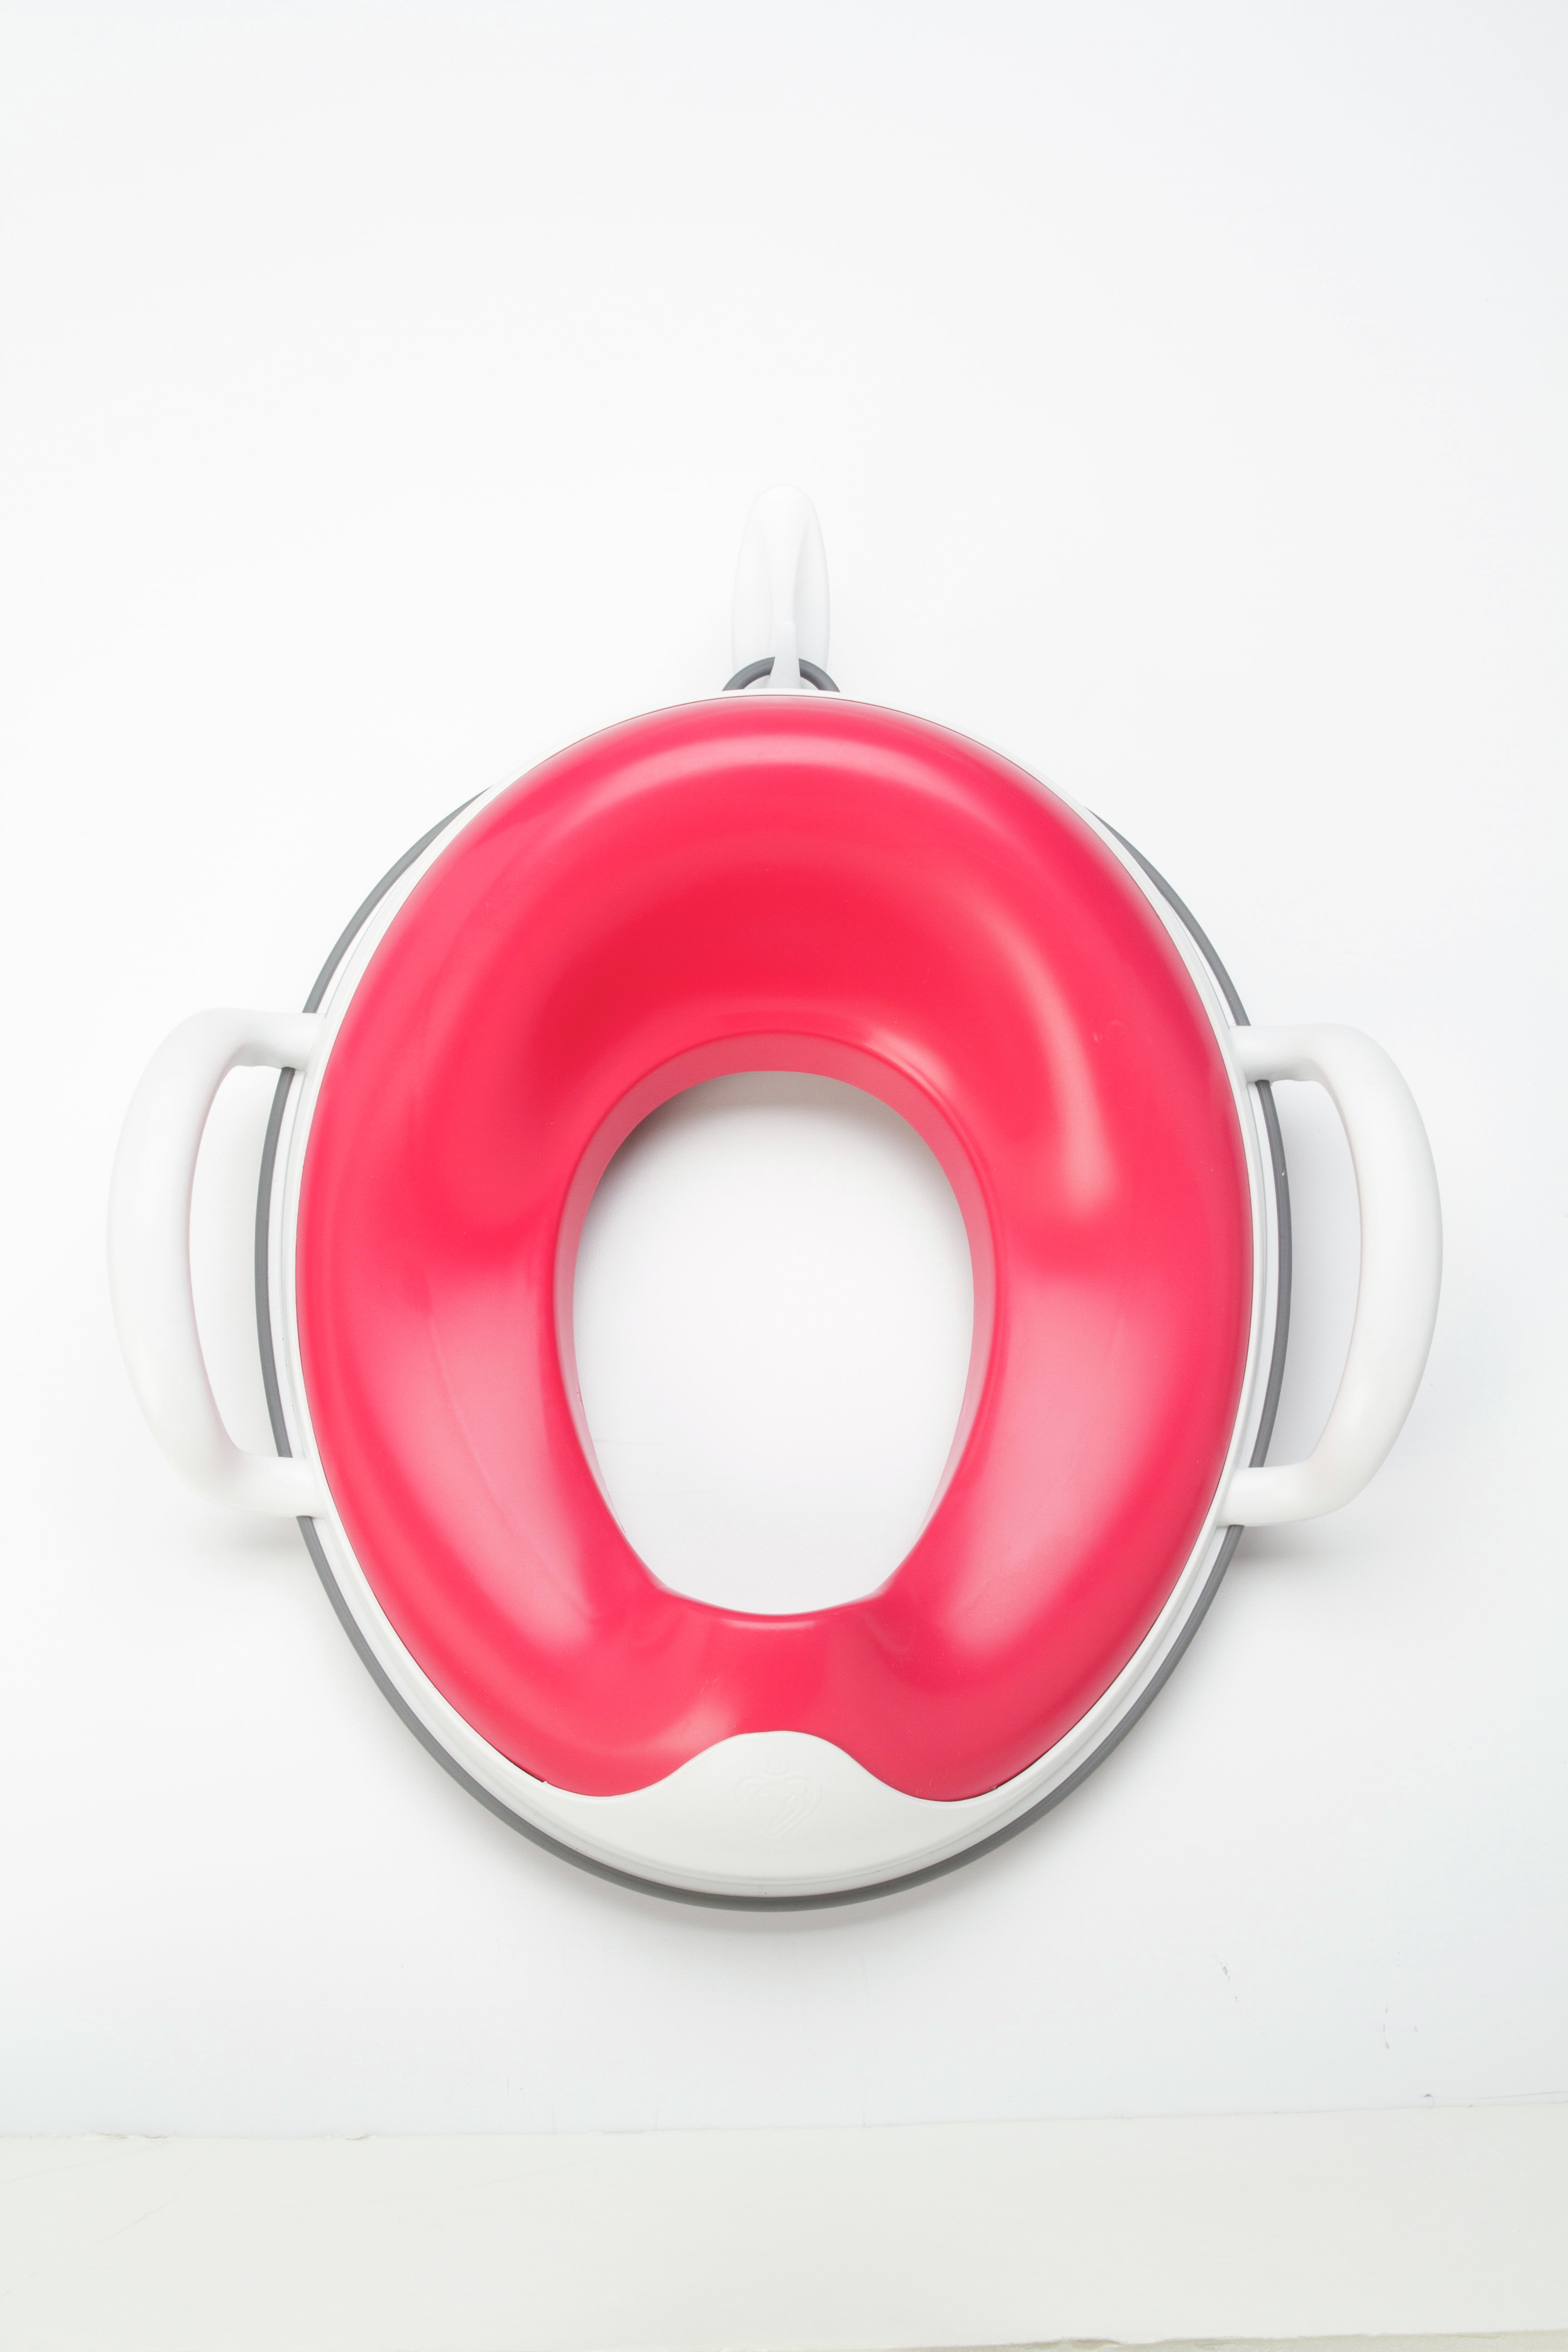 Prince Lionheart weePod Toilet Trainer - Flashbulb Fuchsia